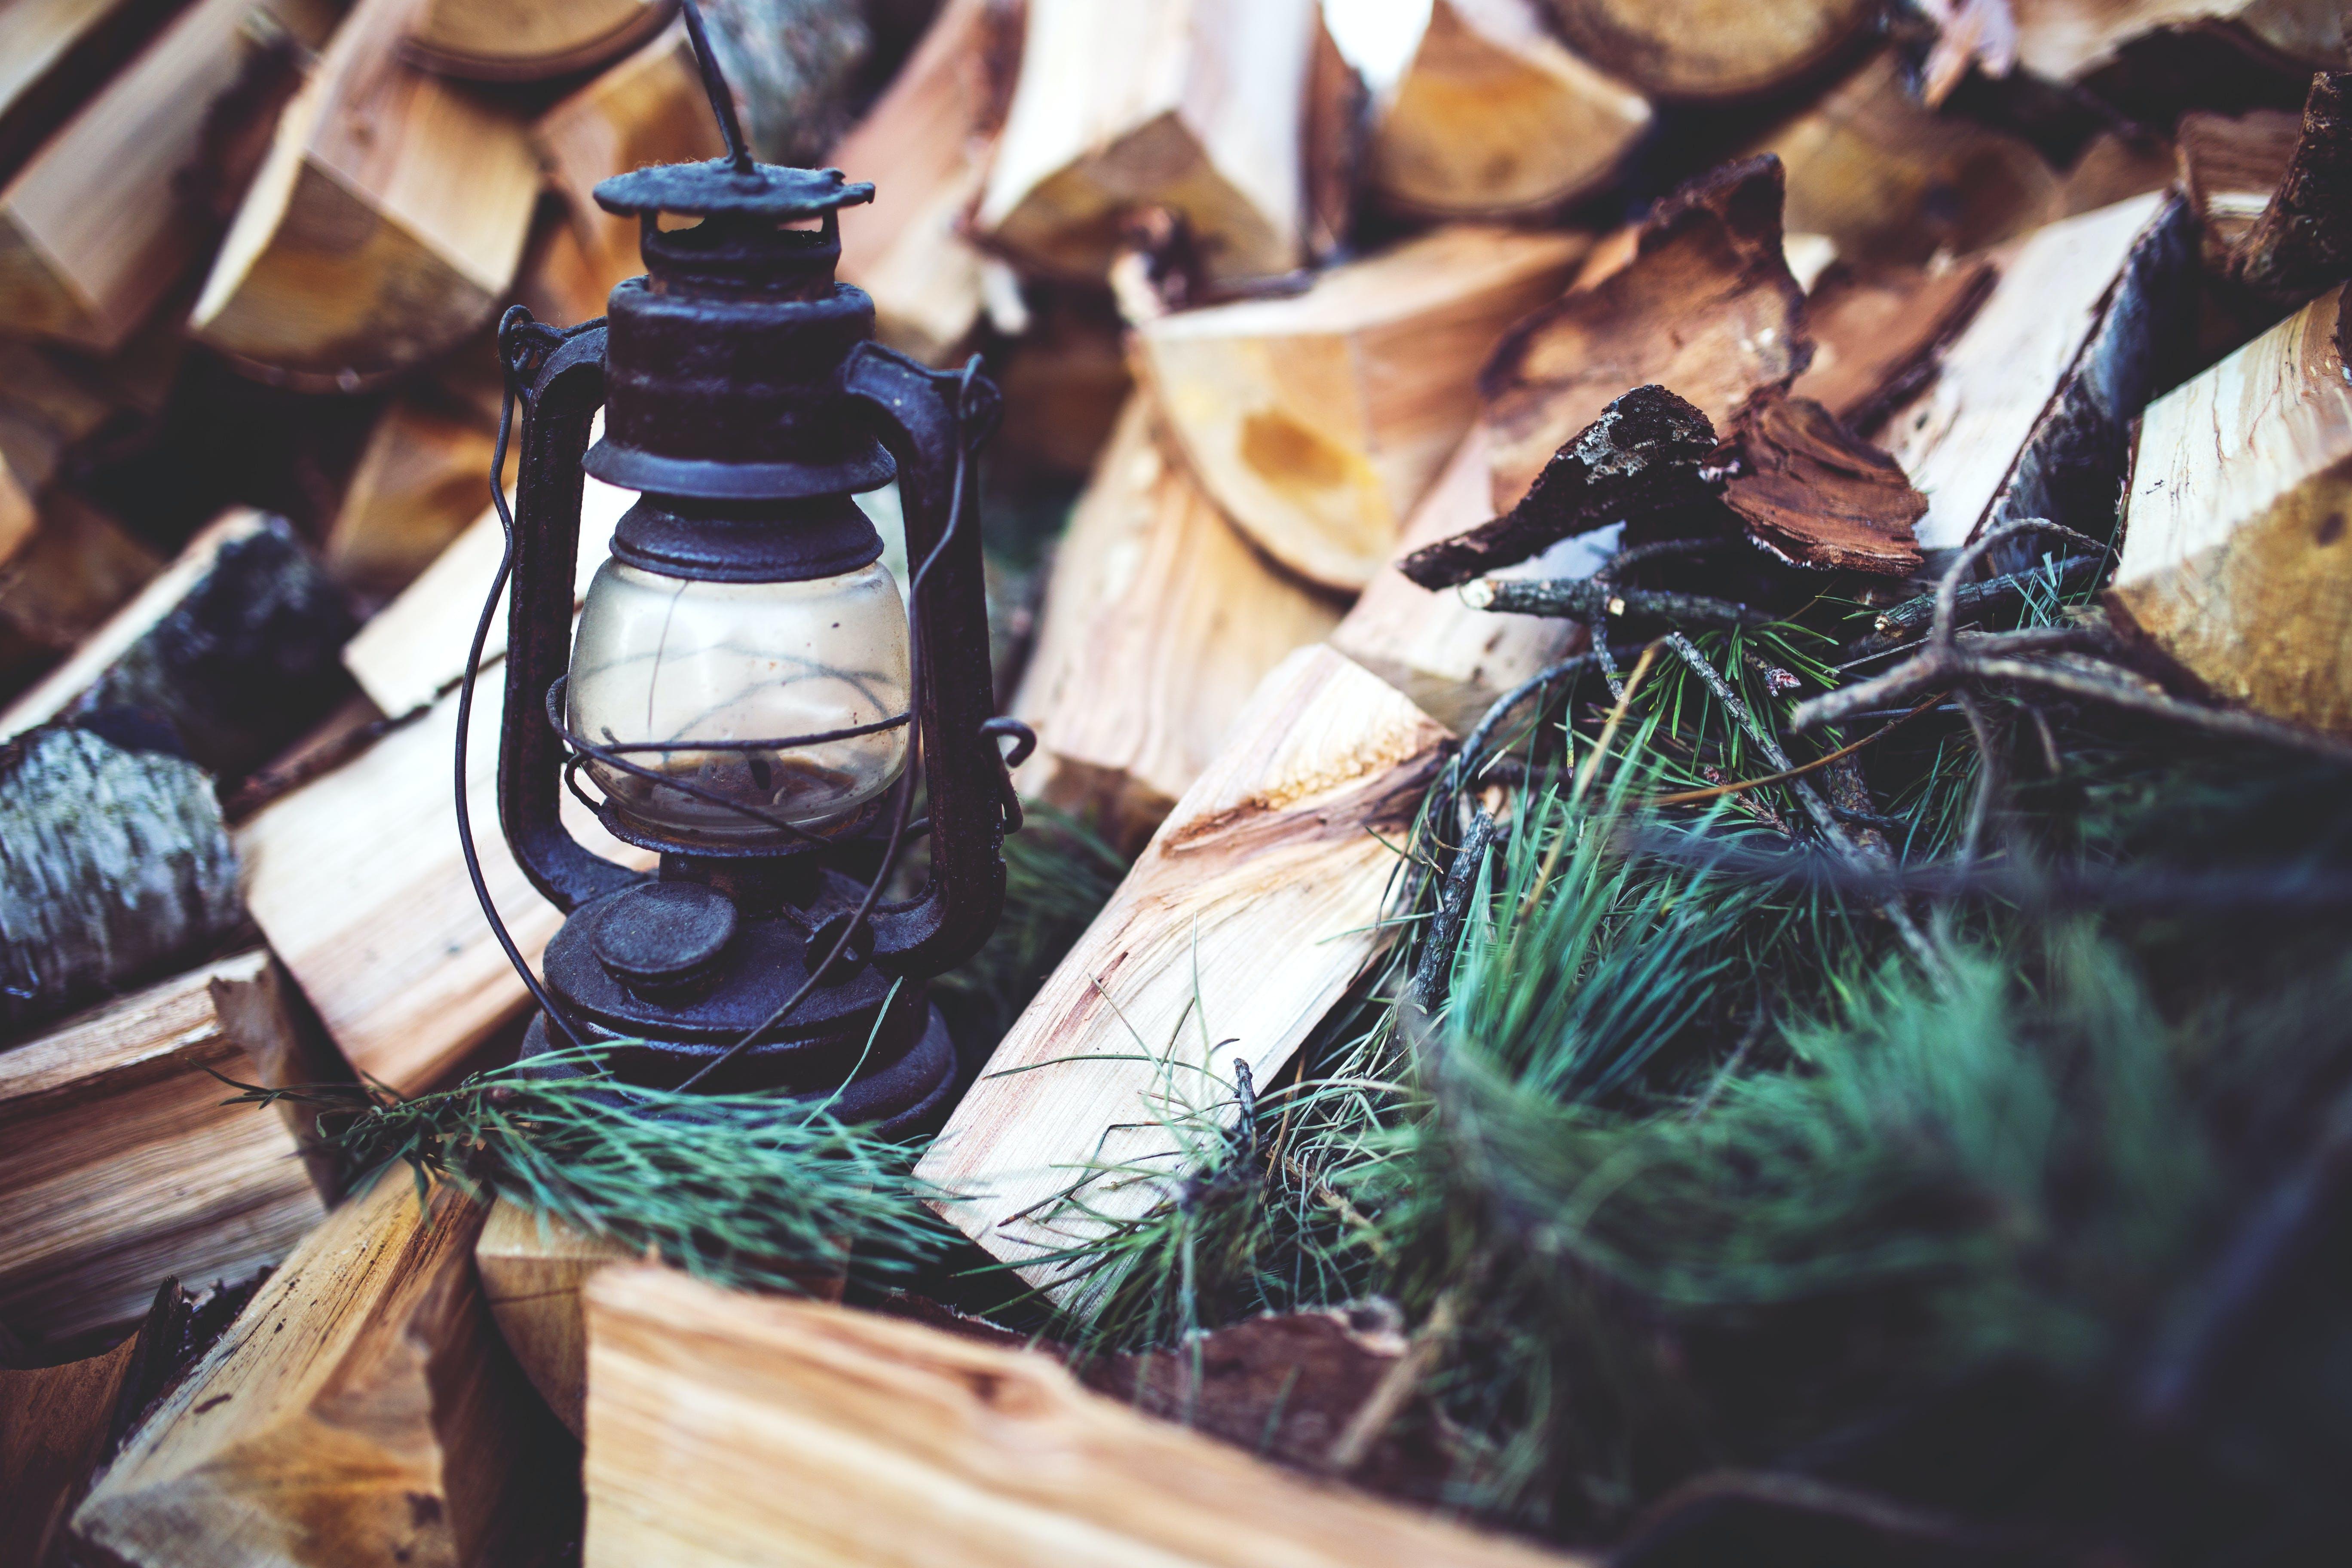 Kerosene lamp on the wood